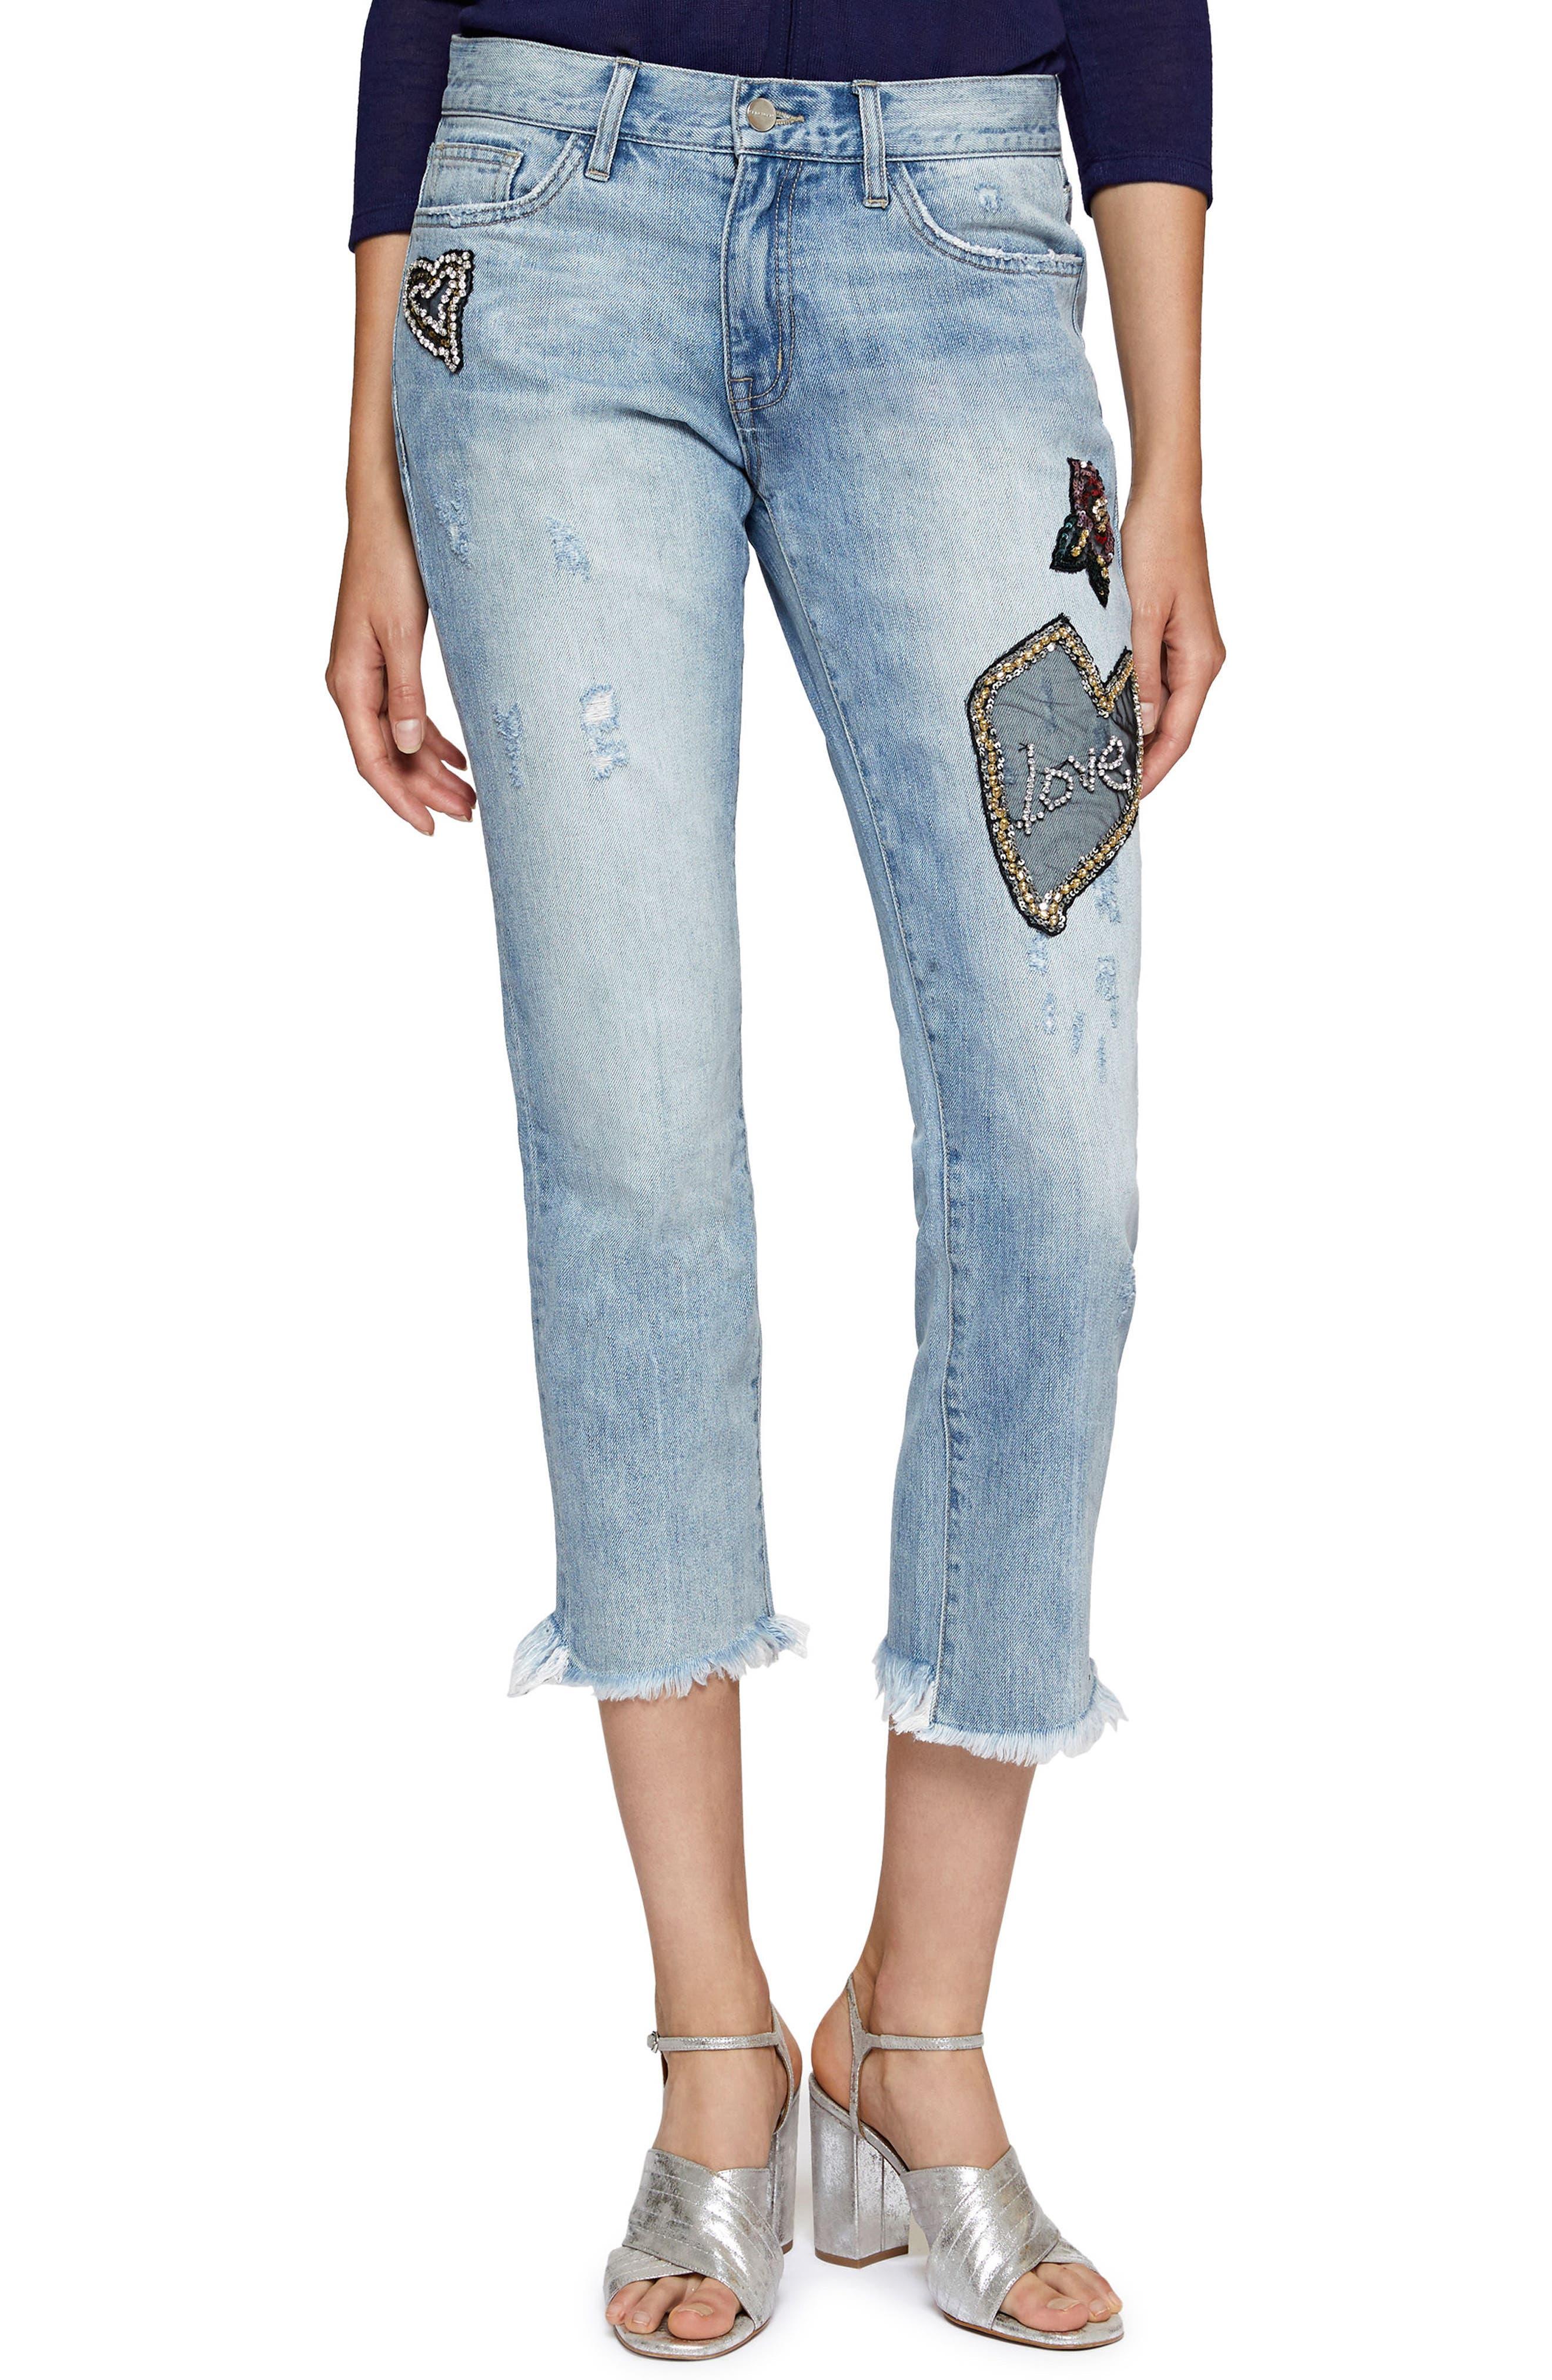 Alternate Image 1 Selected - Sanctuary Heartbreaker Patched Slim Boyfriend Jeans (Margaux)